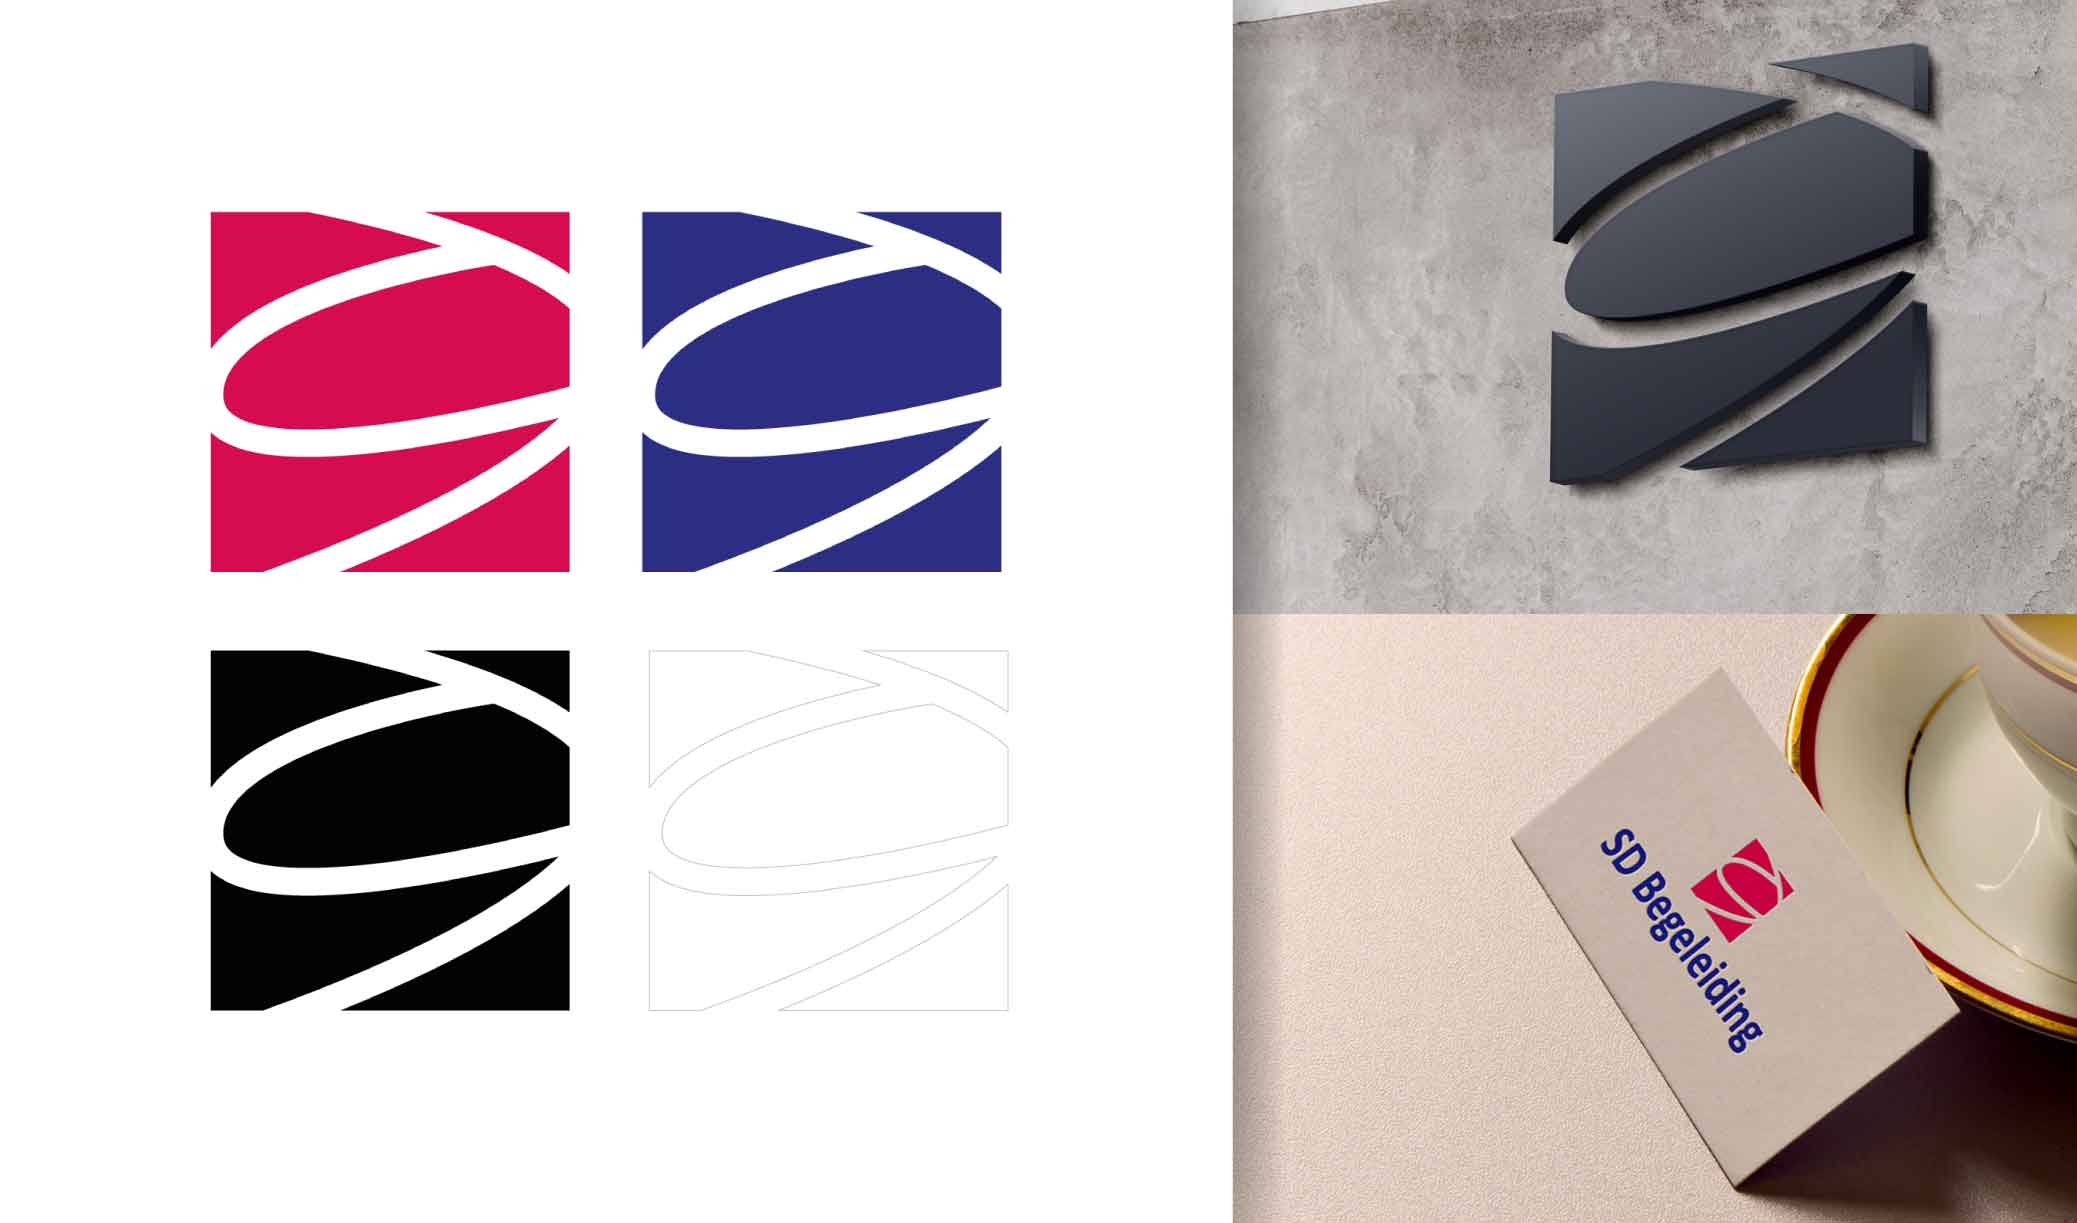 project-6-branding-logo-sdbegeleiding